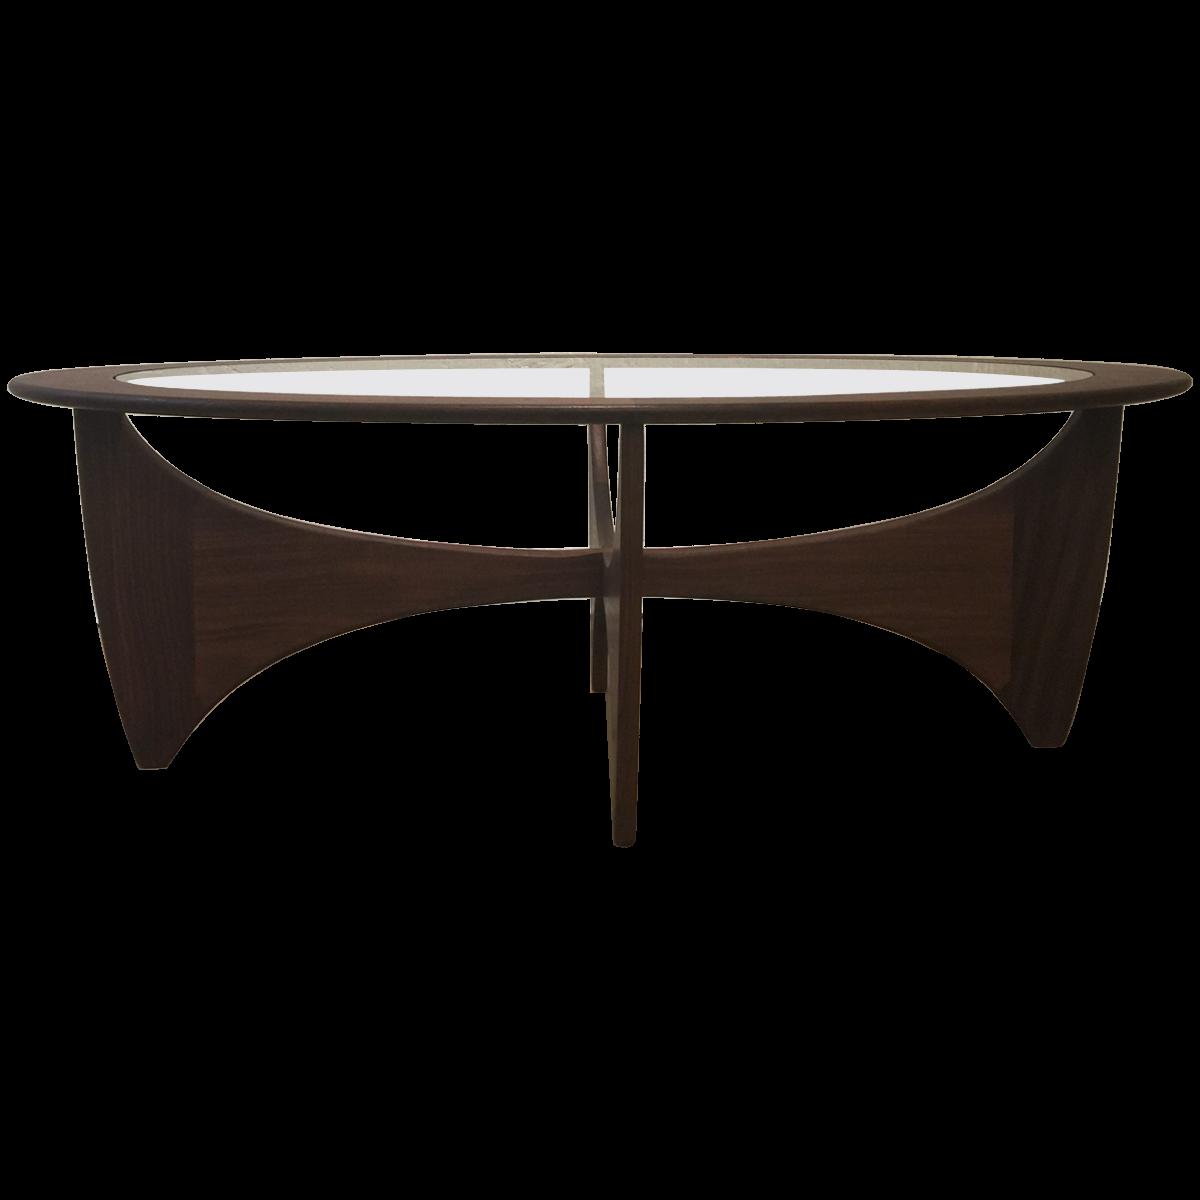 Mid Century Modern Oval Coffee Table Mid 20th Century Mid Century Style Coffee Table Mid Century Modern Oval Coffee Table [ 1200 x 1200 Pixel ]